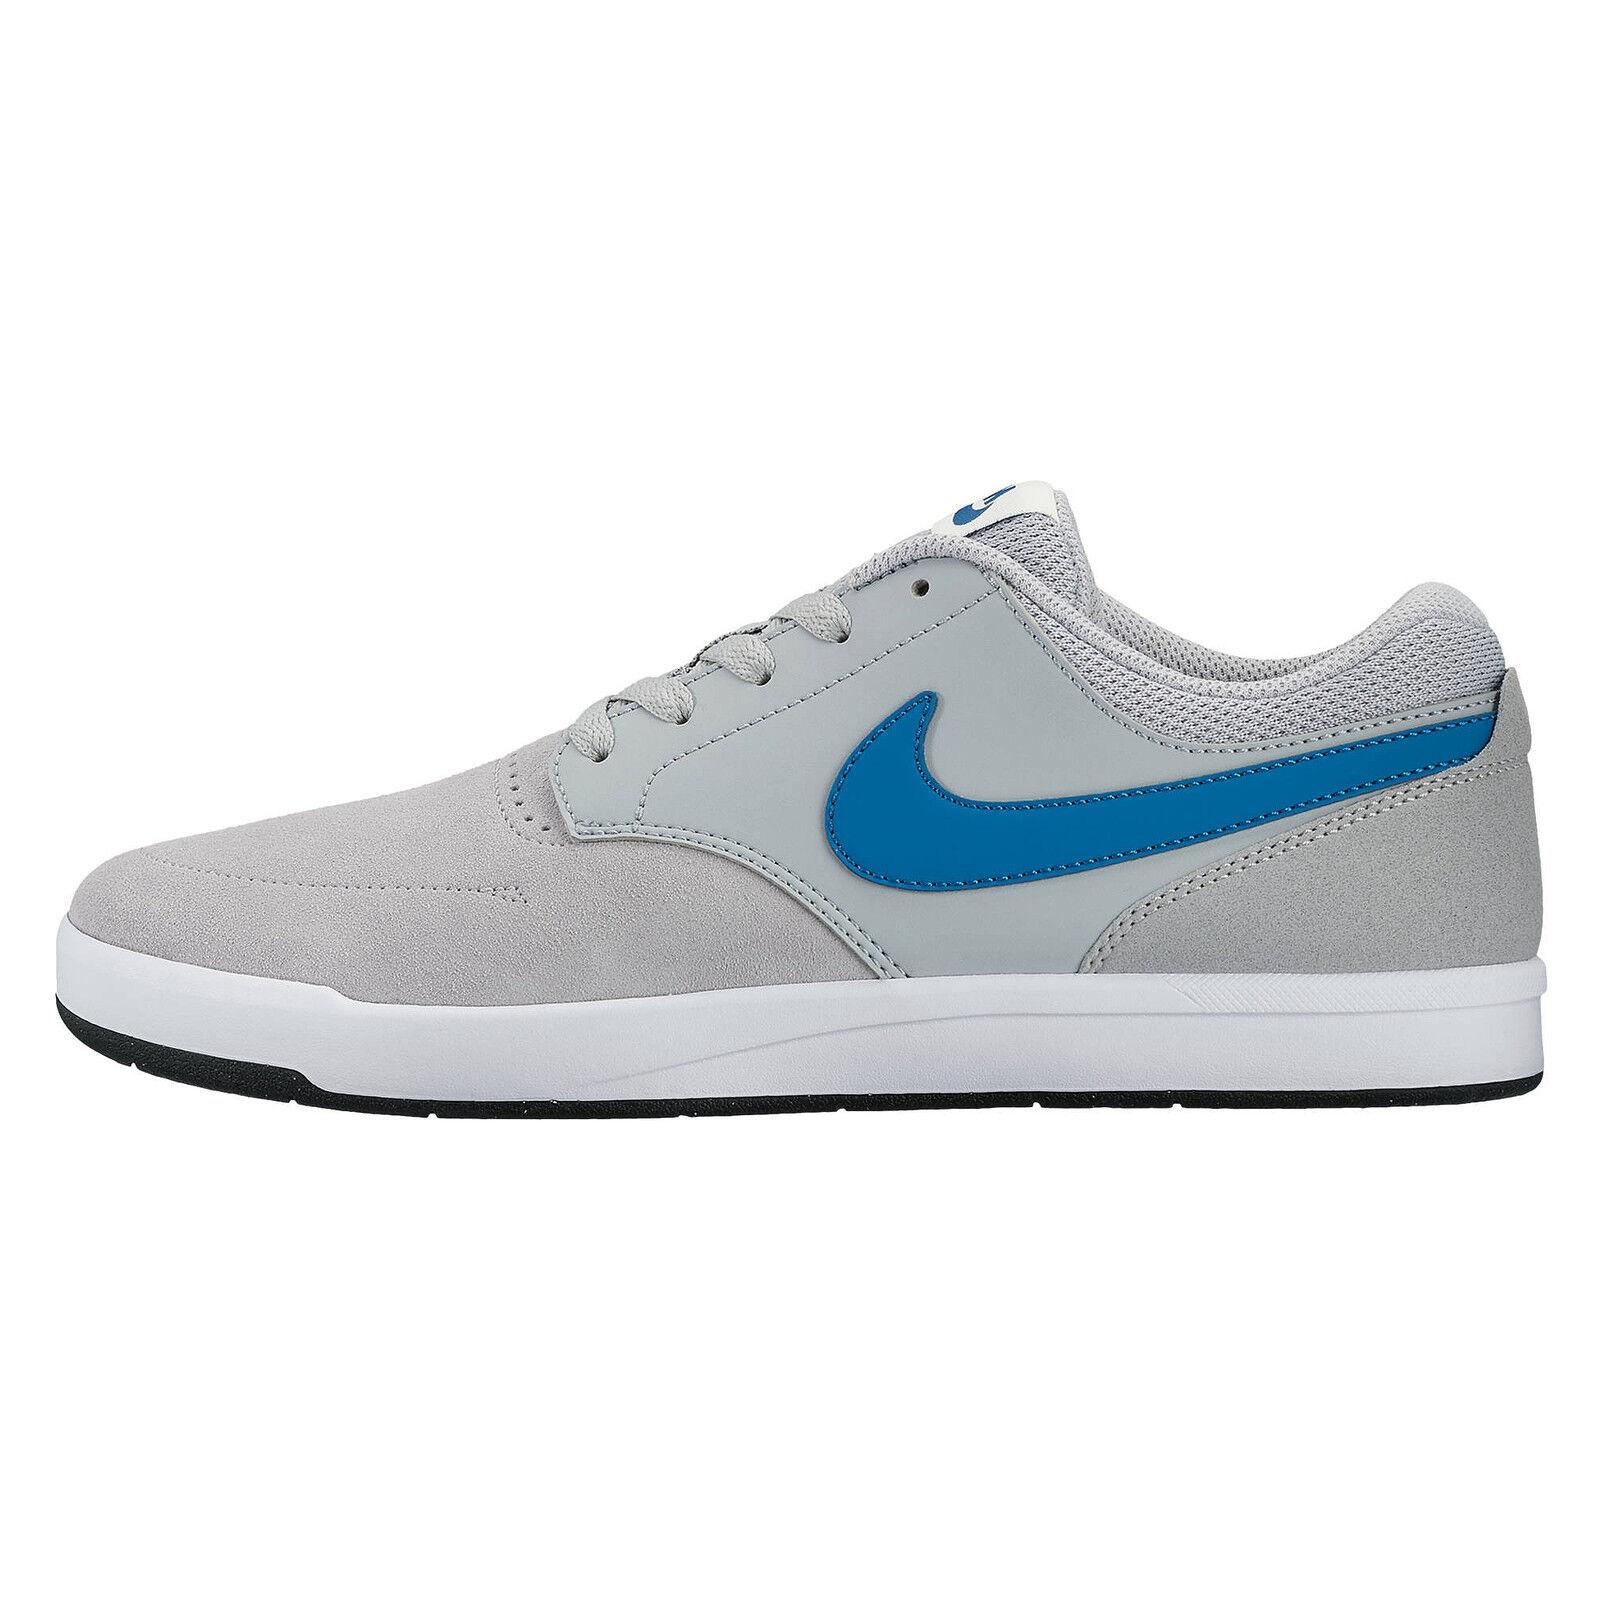 Nike SB Fokus 749477-041 SCARPE TEMPO LIBERO SNEAKER Casual wild